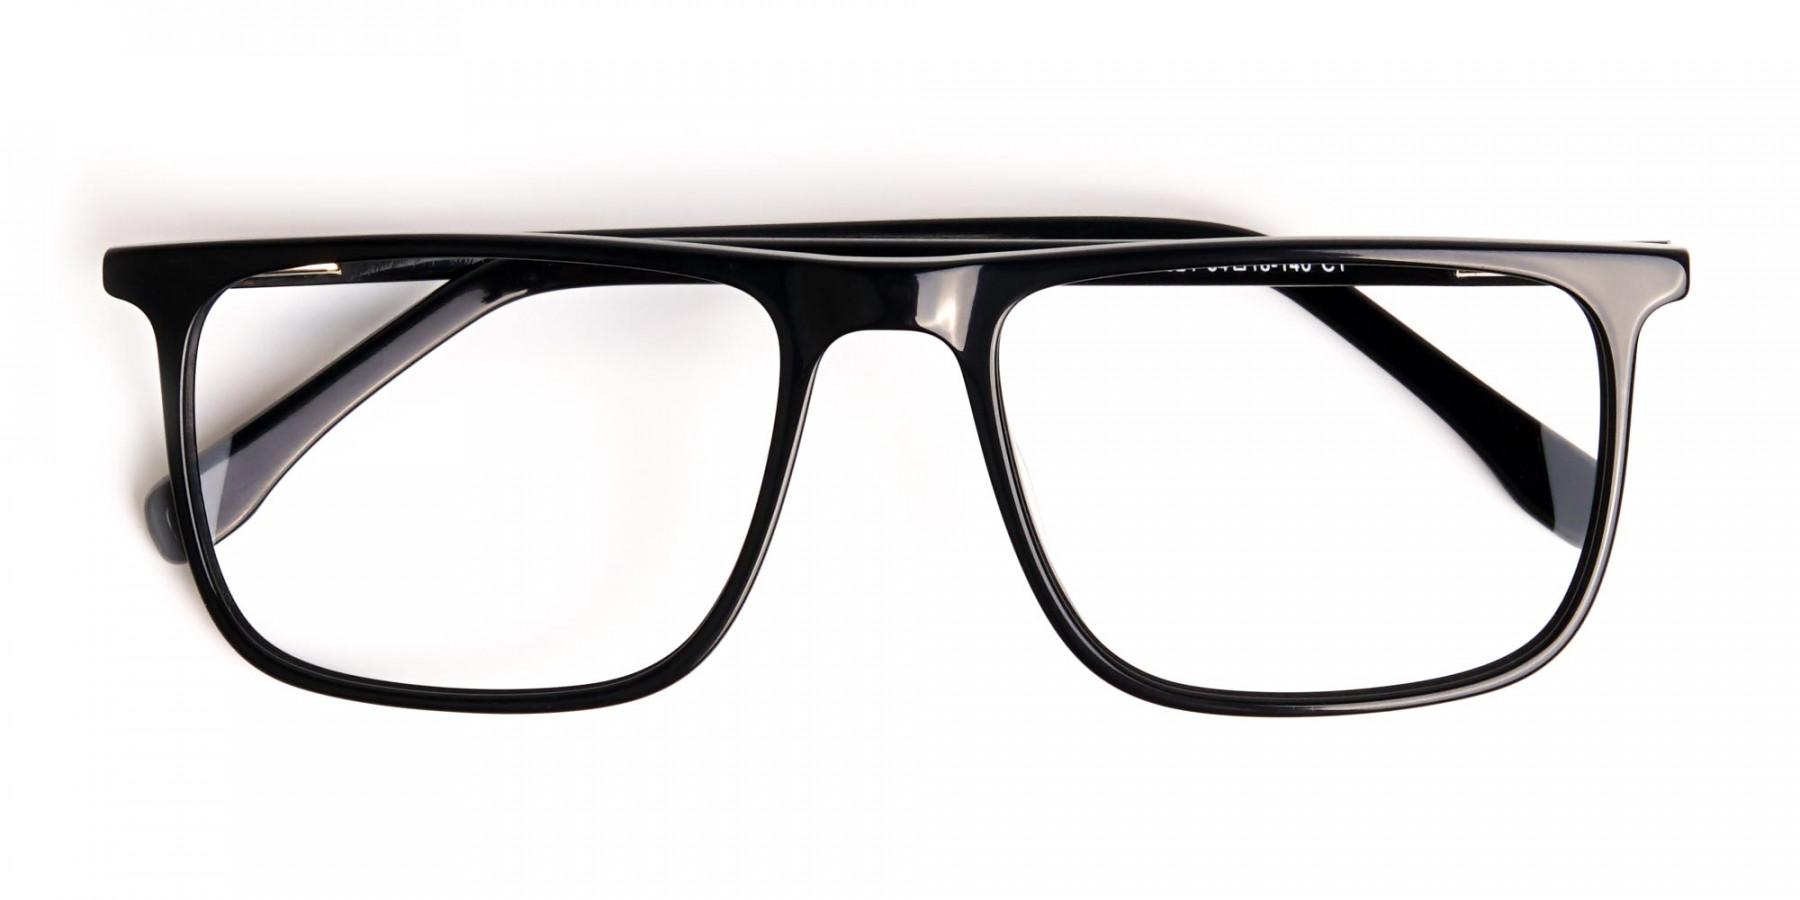 black-and-grey-rectangular-glasses-frames-1